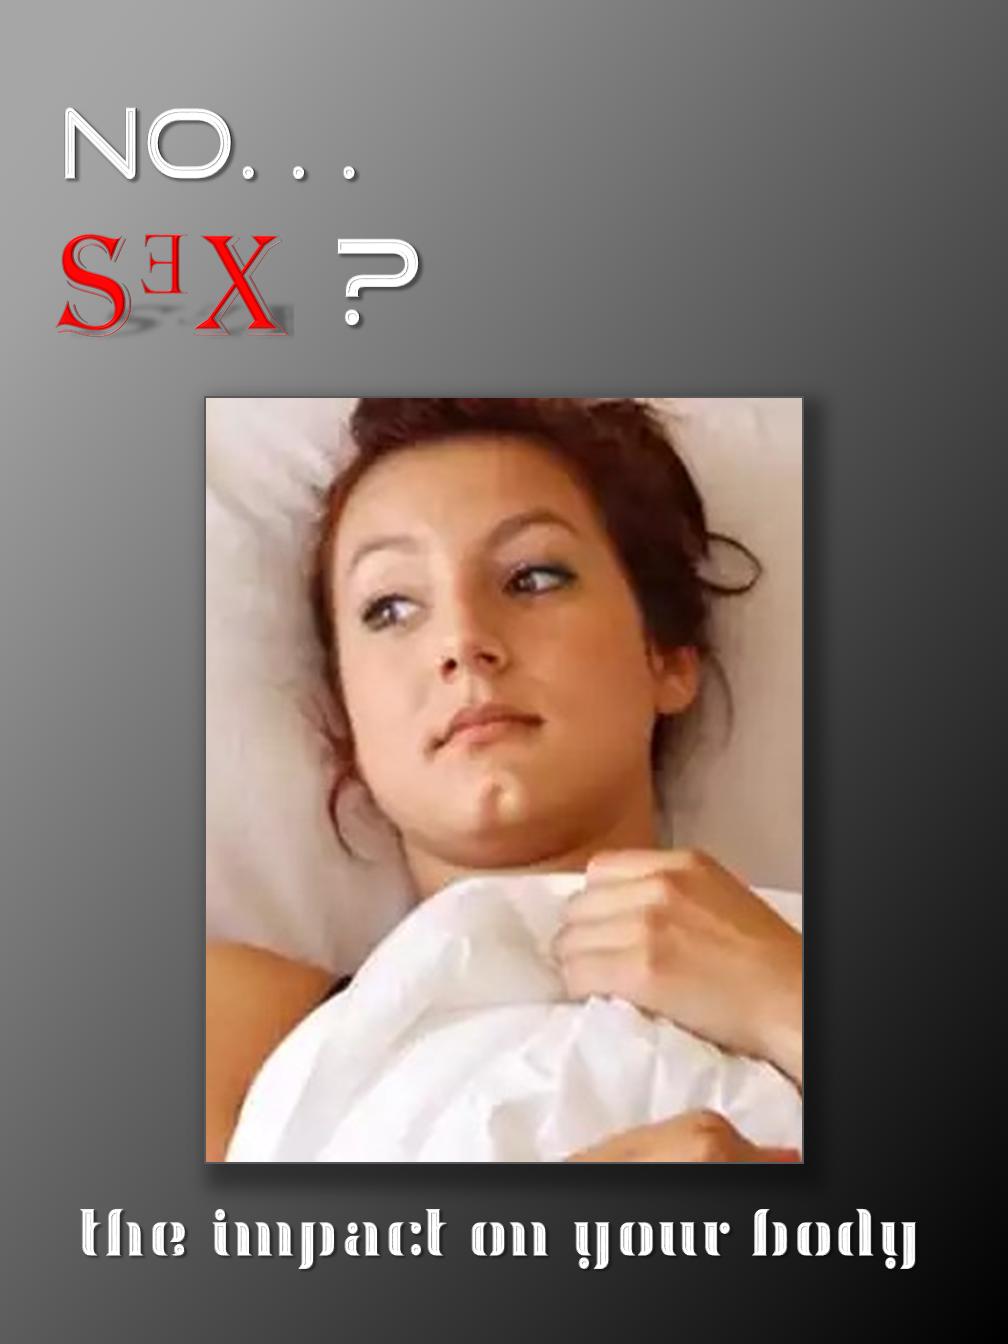 No...SEX?